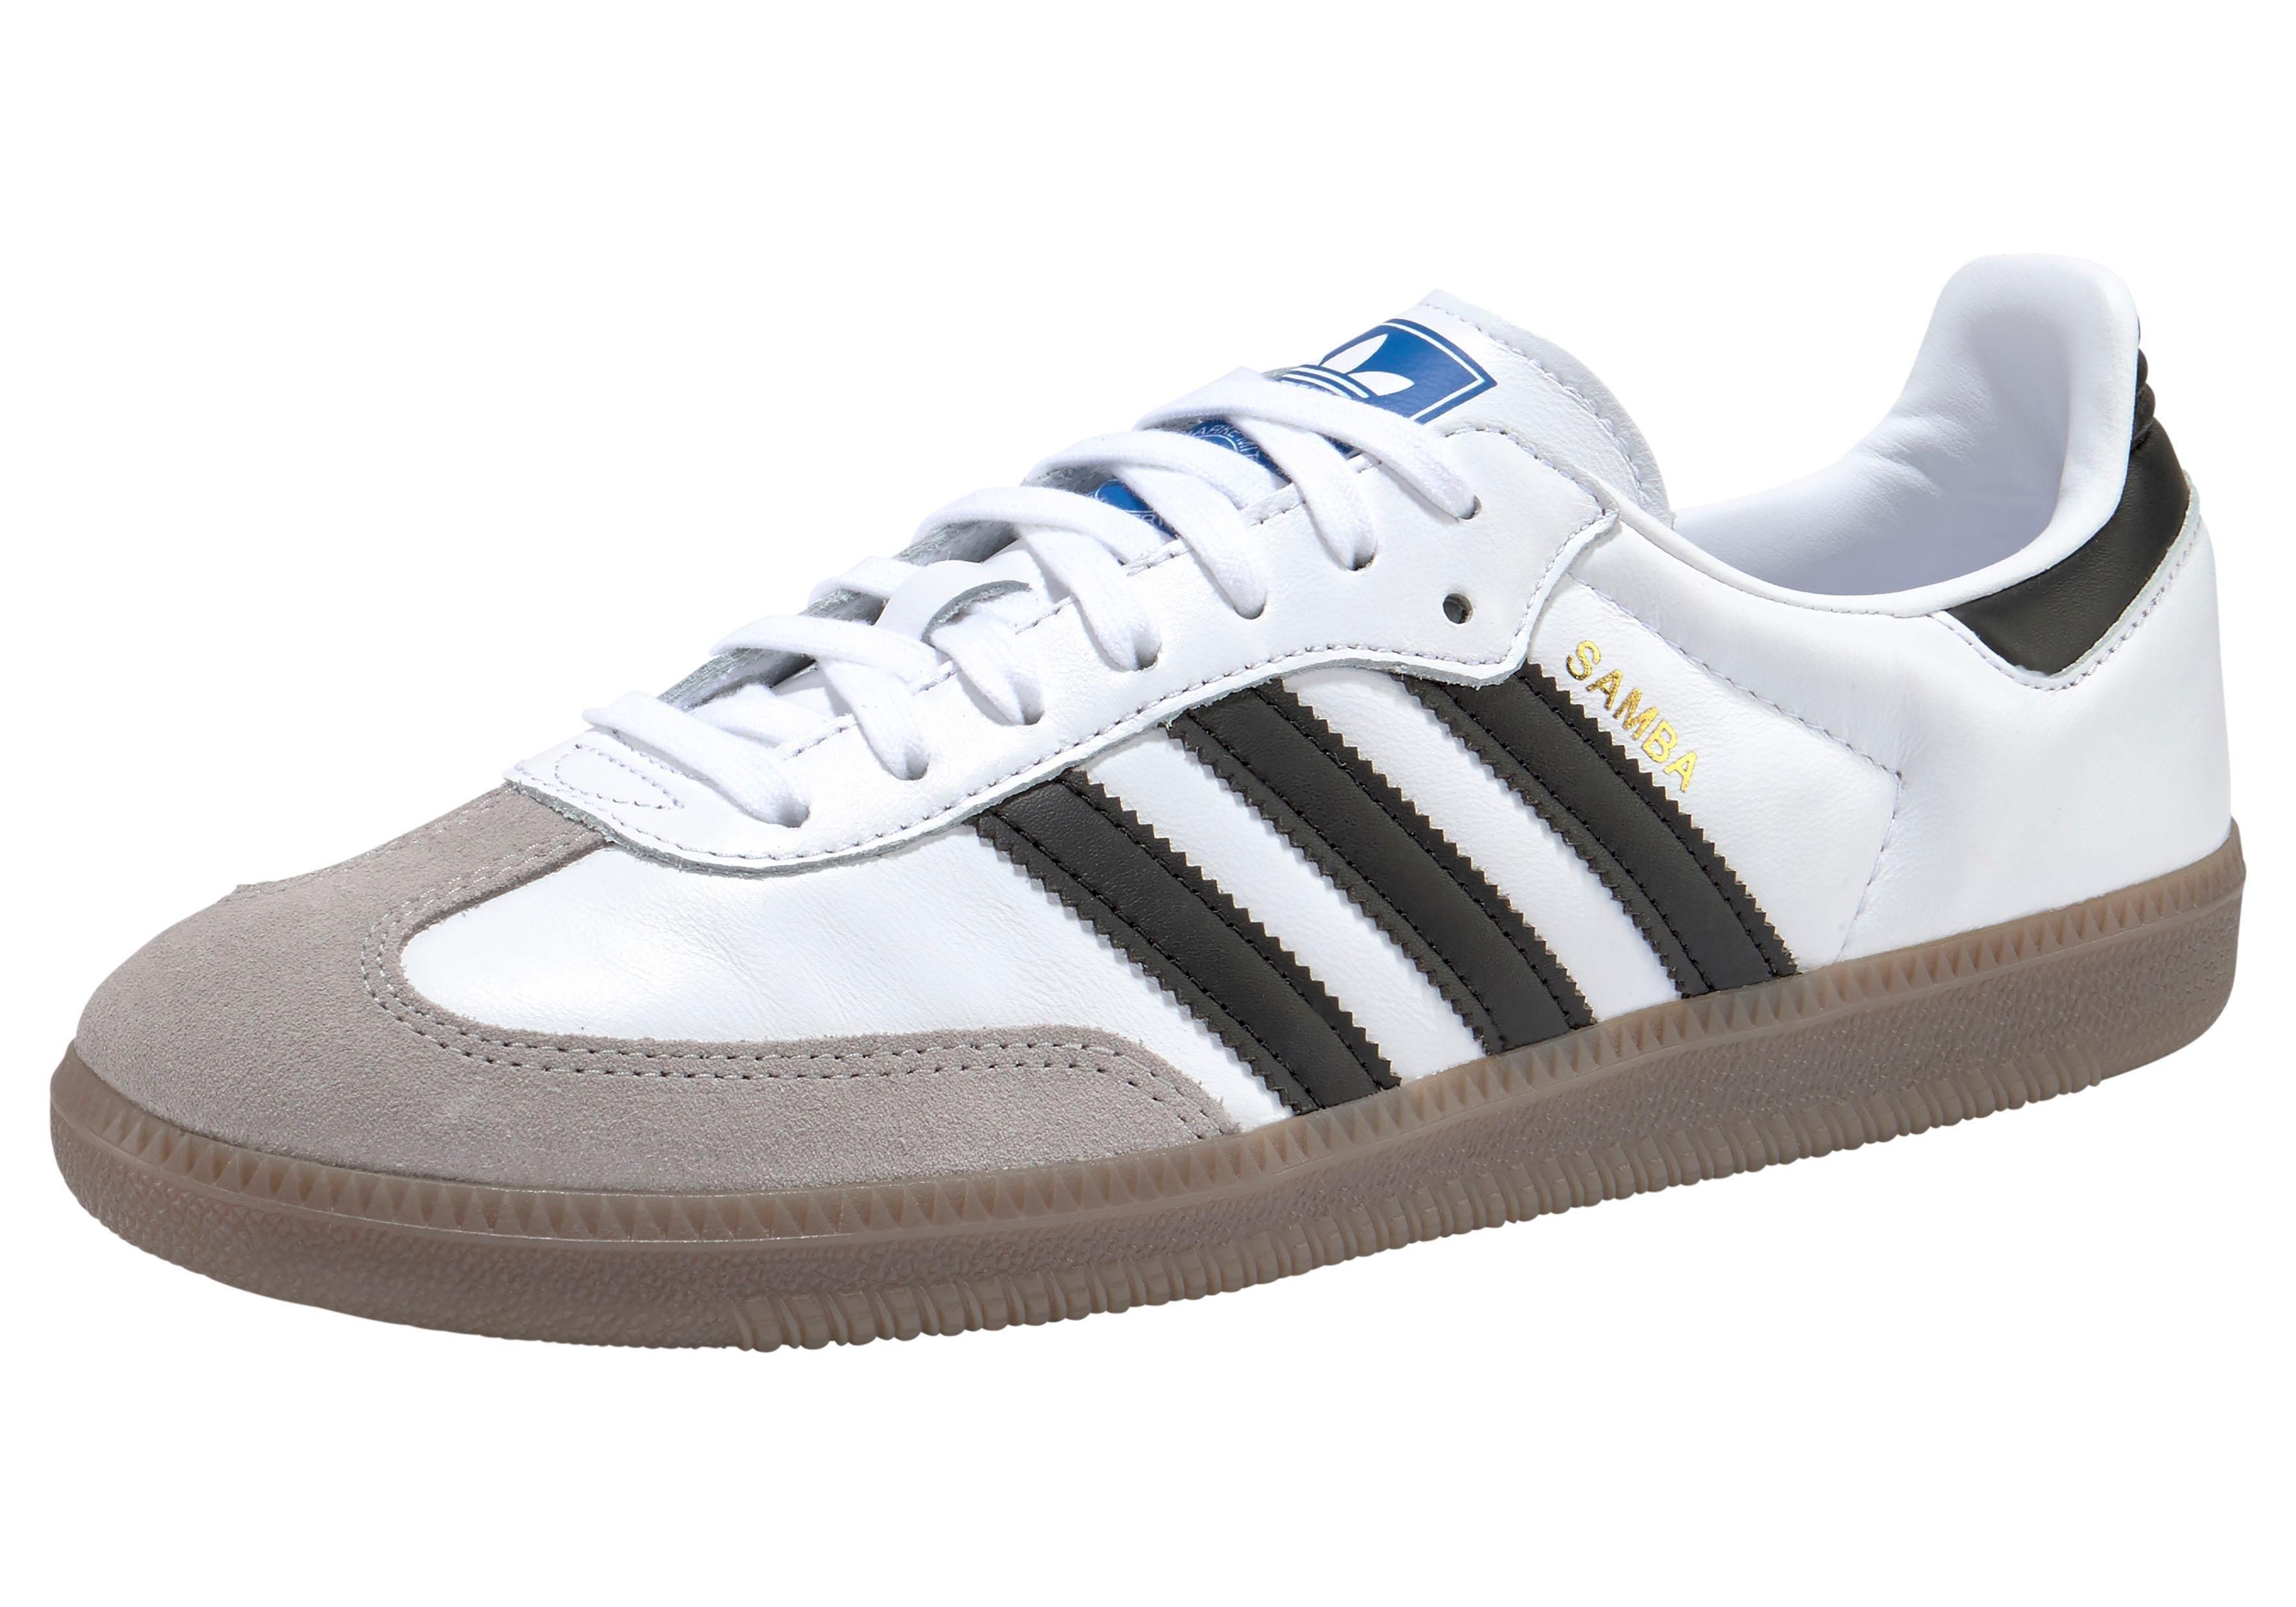 1d800d05ae6 adidas Originals sneakers »Samba OG« makkelijk gevonden | OTTO